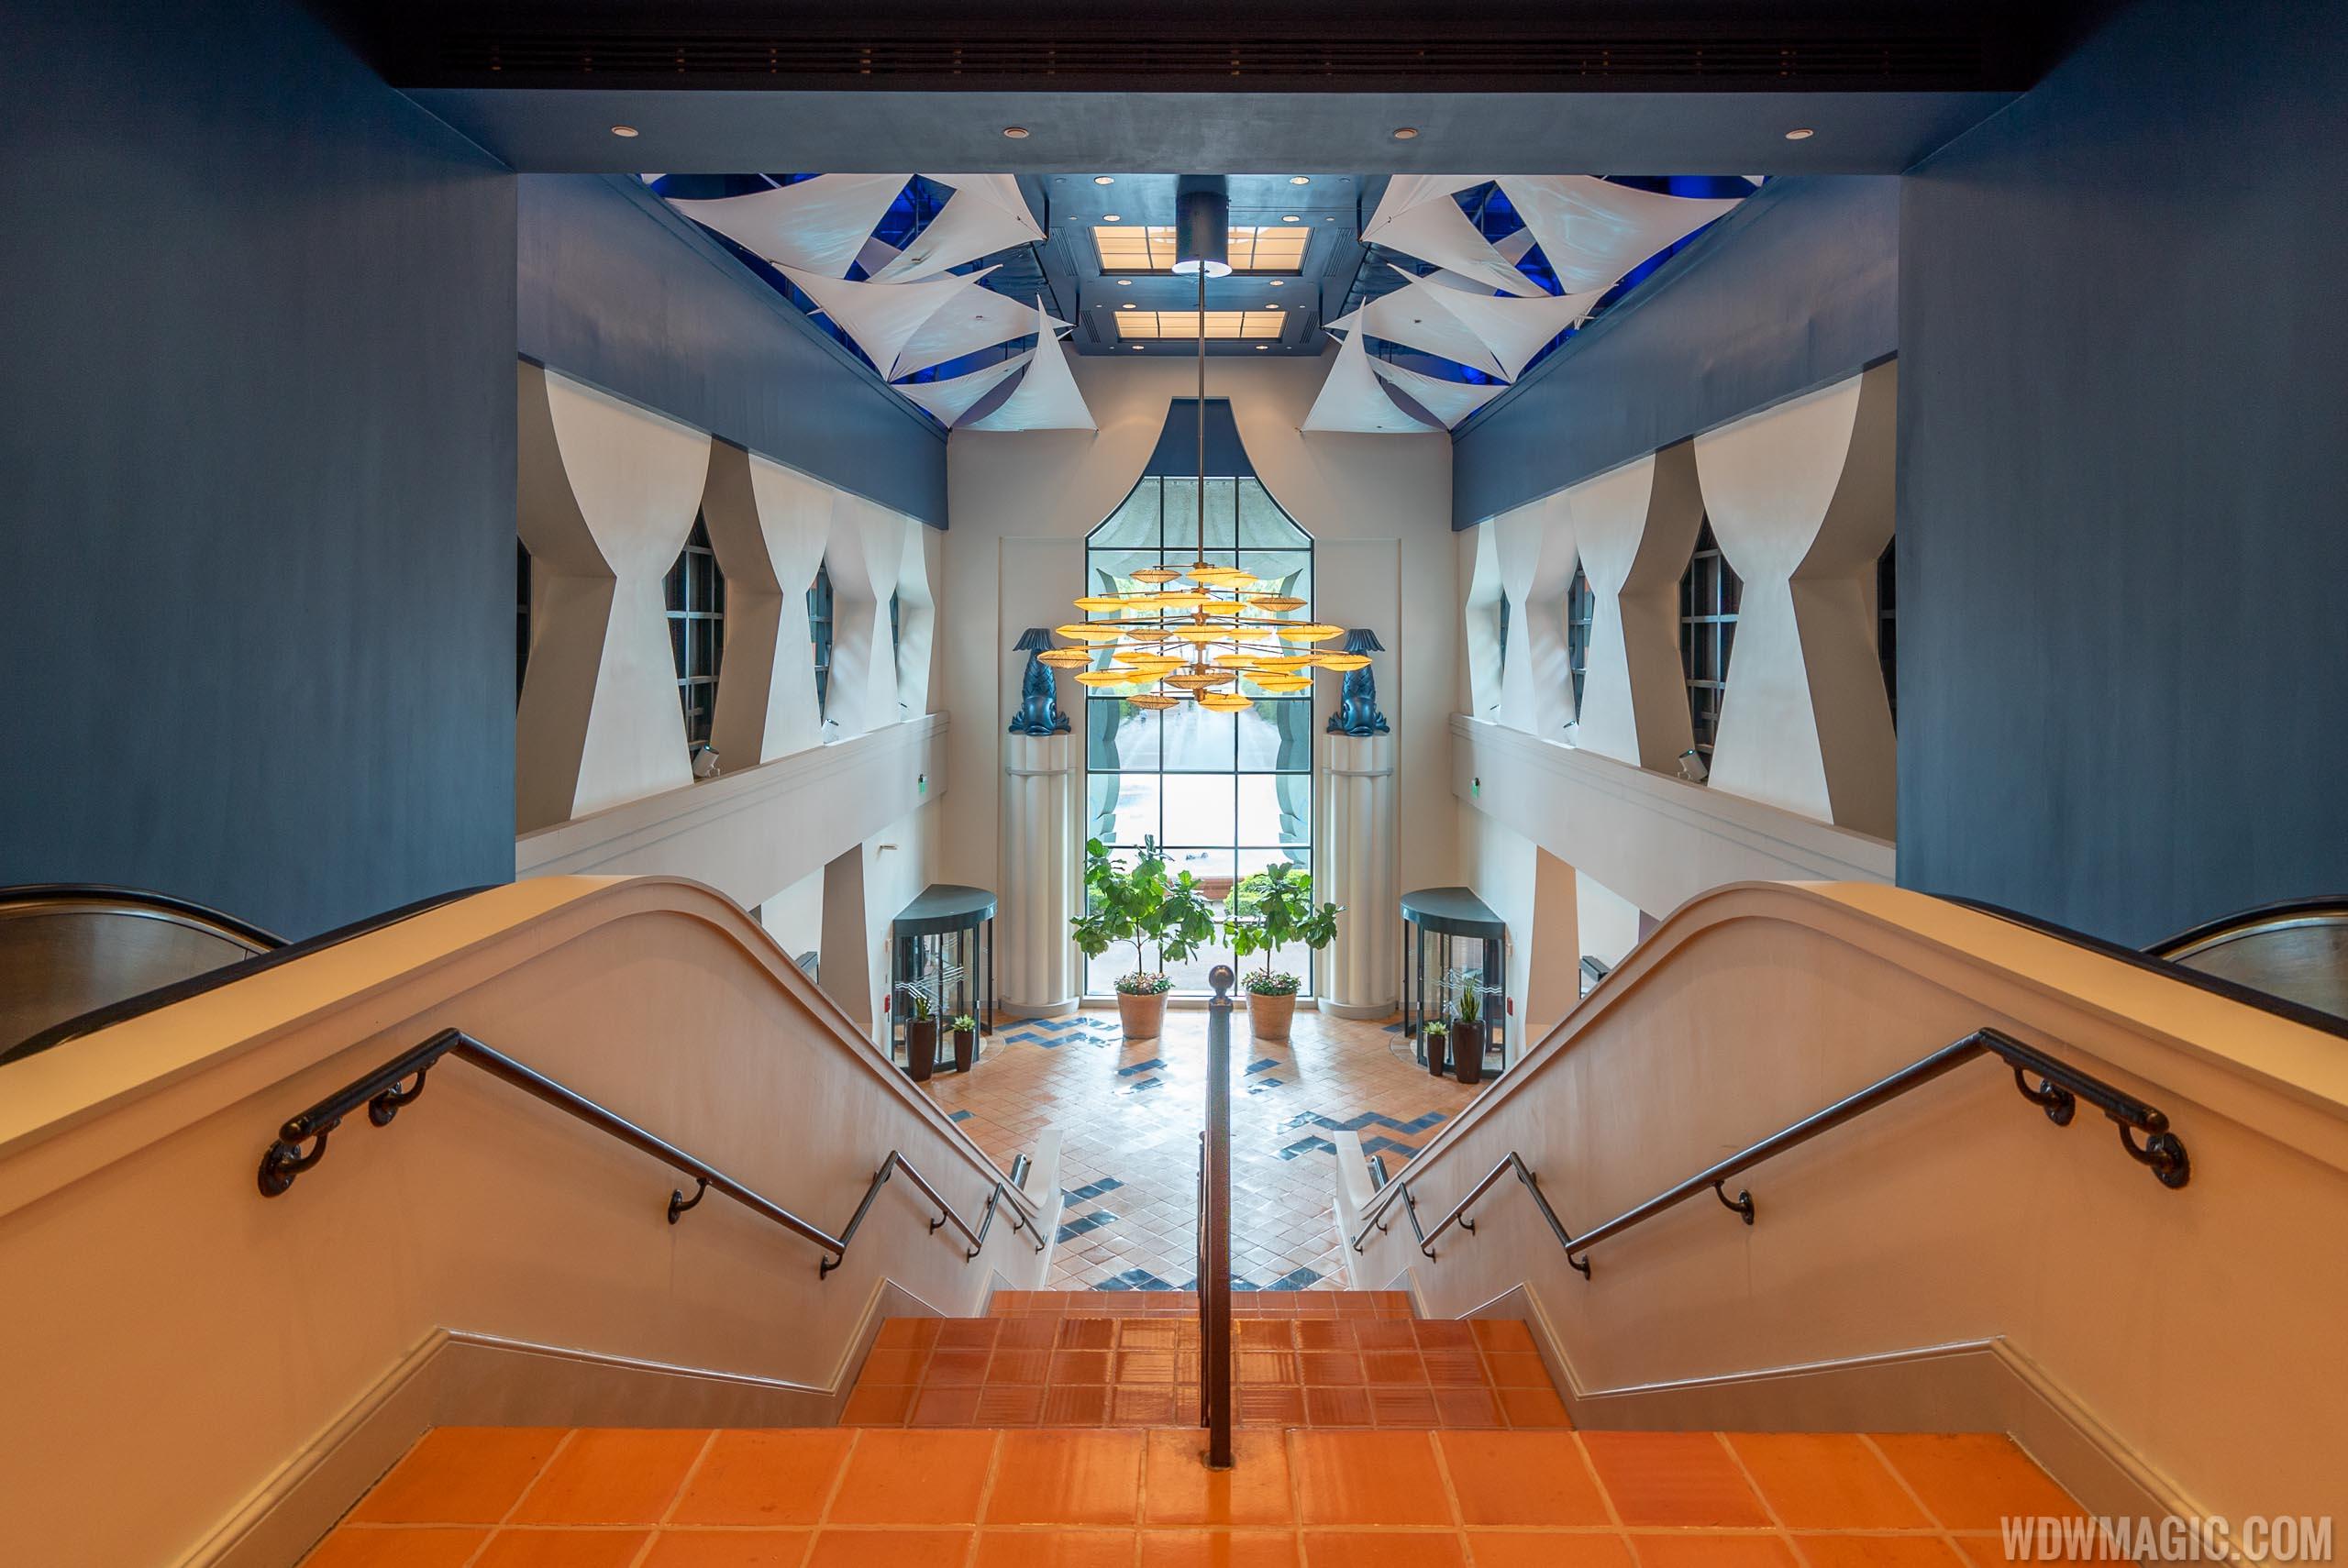 New look Walt Disney World Dolphin escalator and stairway